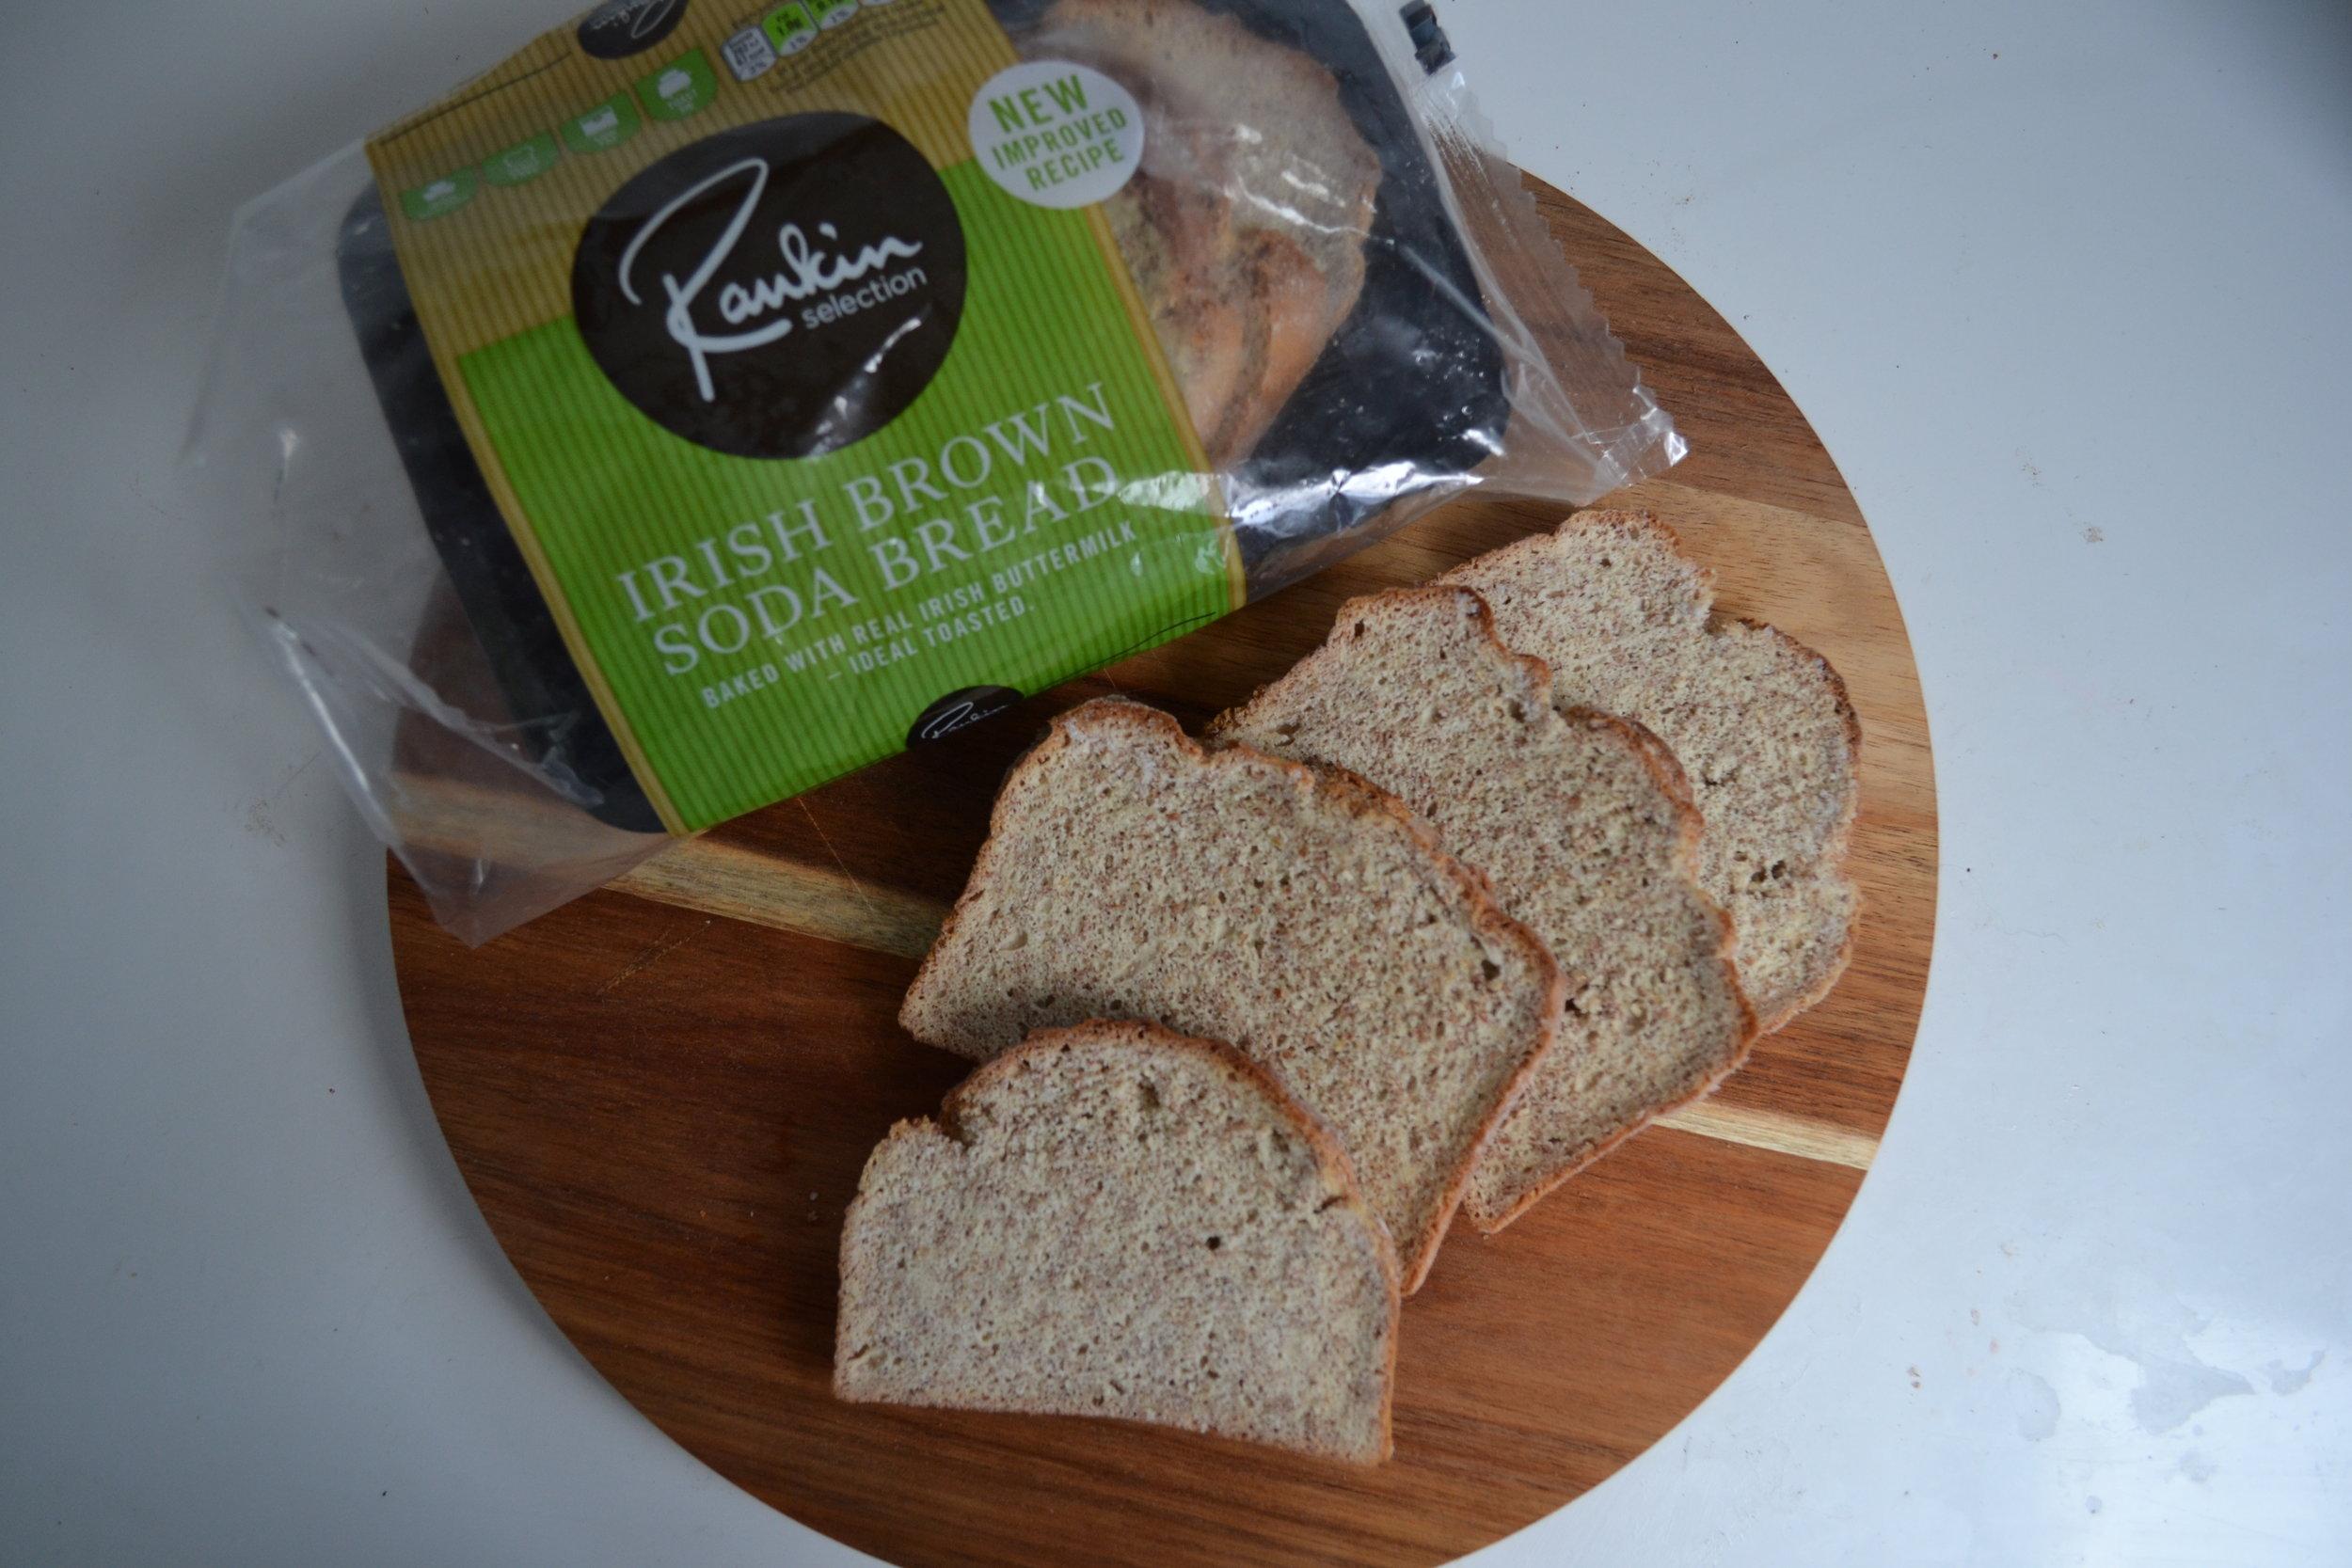 No. 8 Rankin brown soda bread